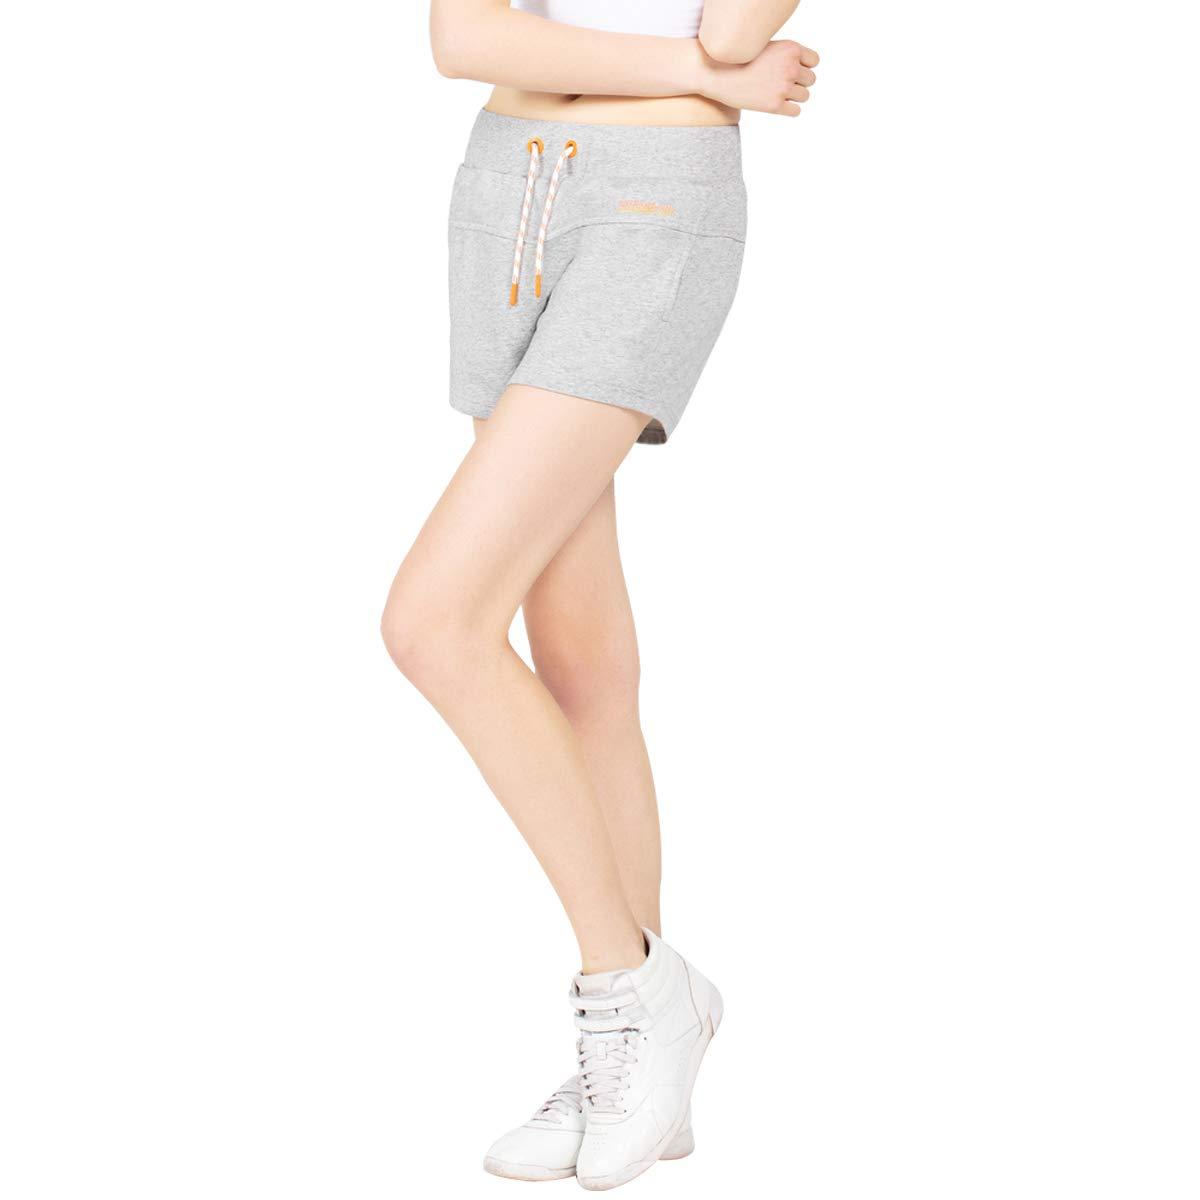 Damen Sport Tank Top Frauen Yoga Shirts Kurze Weste Fitness /Ärmellose Tops Schnell Trocknend Atmungsaktiv Gym T Reflektierende Druckhemd Farben Wei/ß Schwarz S, Wei/ß